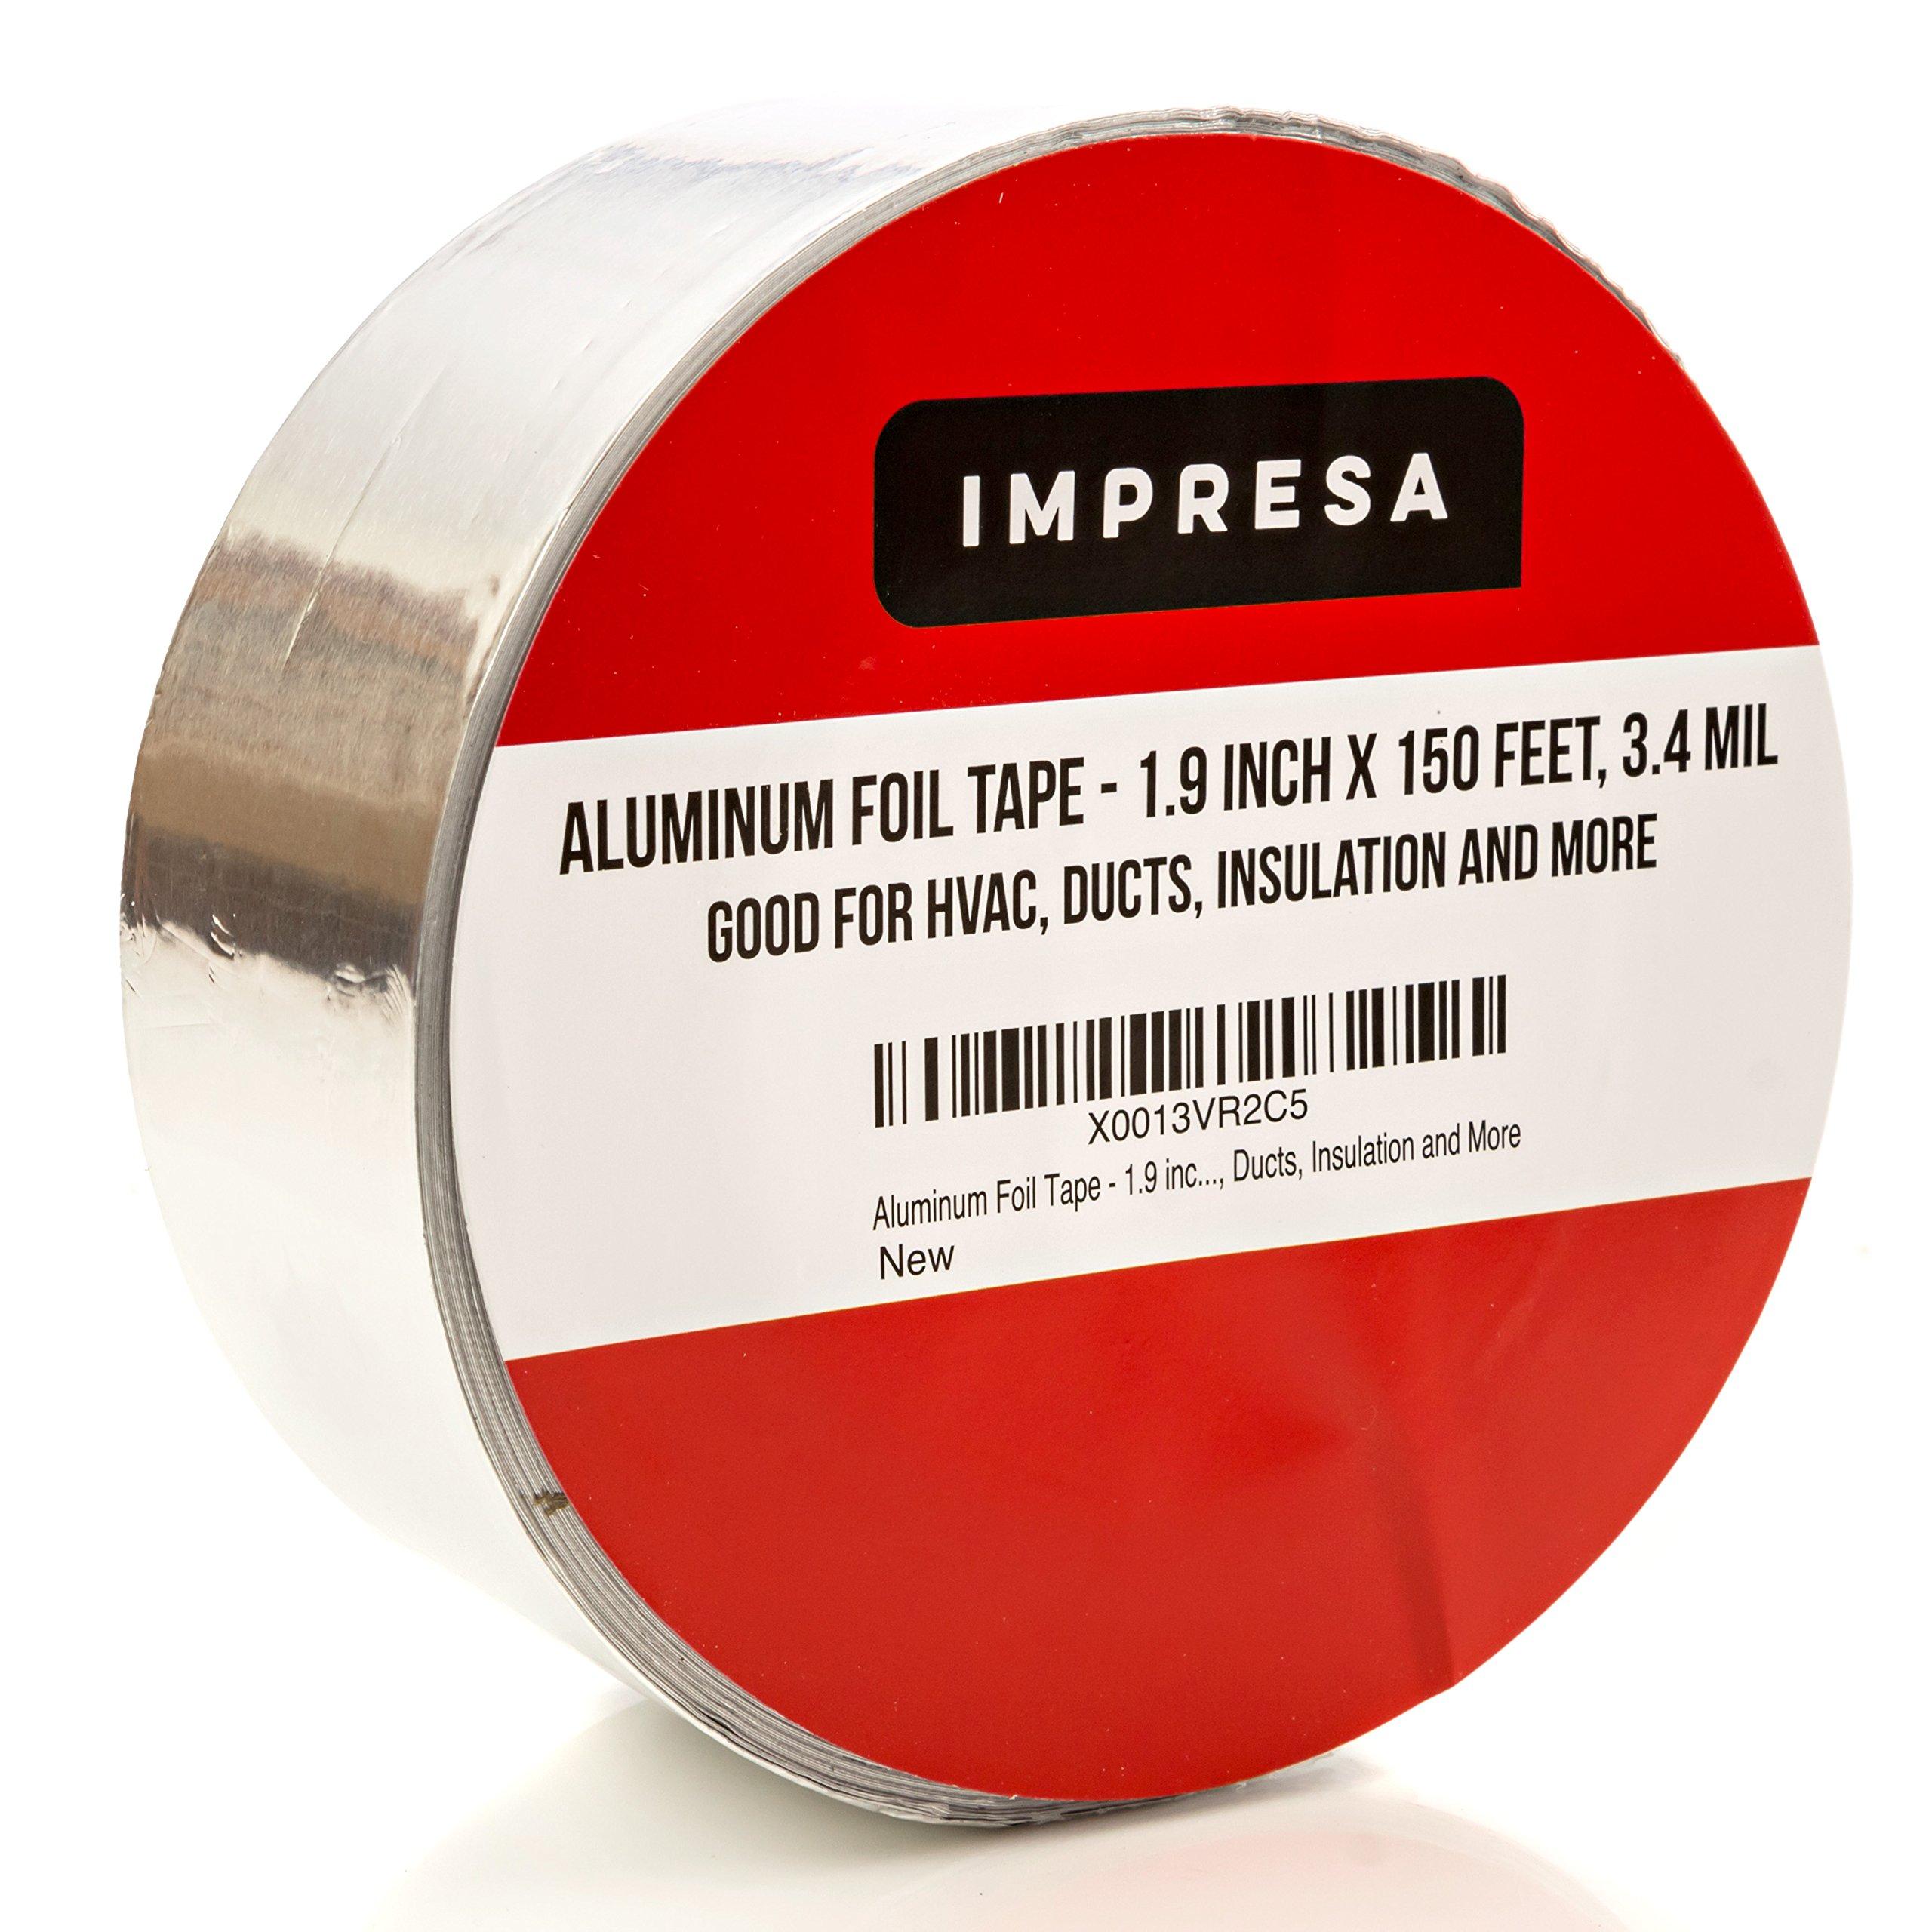 "HVAC Tape Technologies Aluminum Foil Tape 3/"" x 1.7 MIL x 150 ft each 3 Rolls"